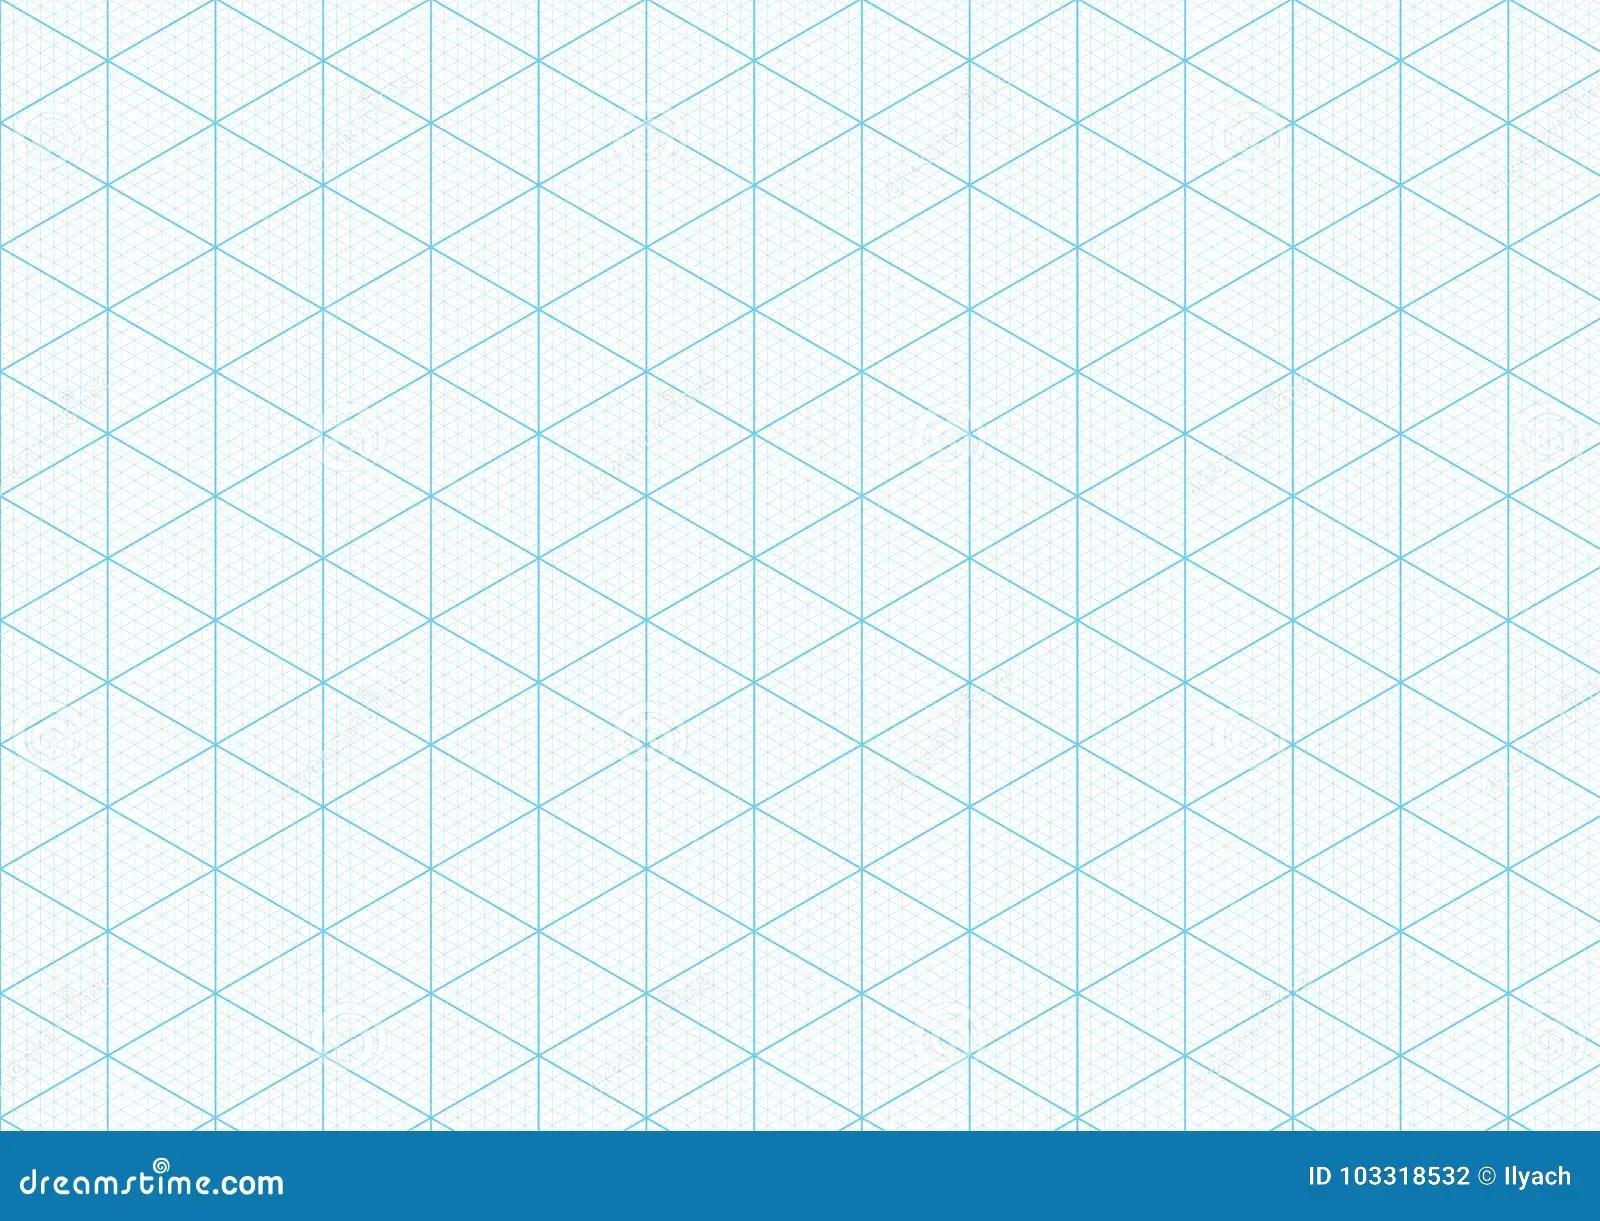 Isometric Graph Paper Background Plotting Triangular